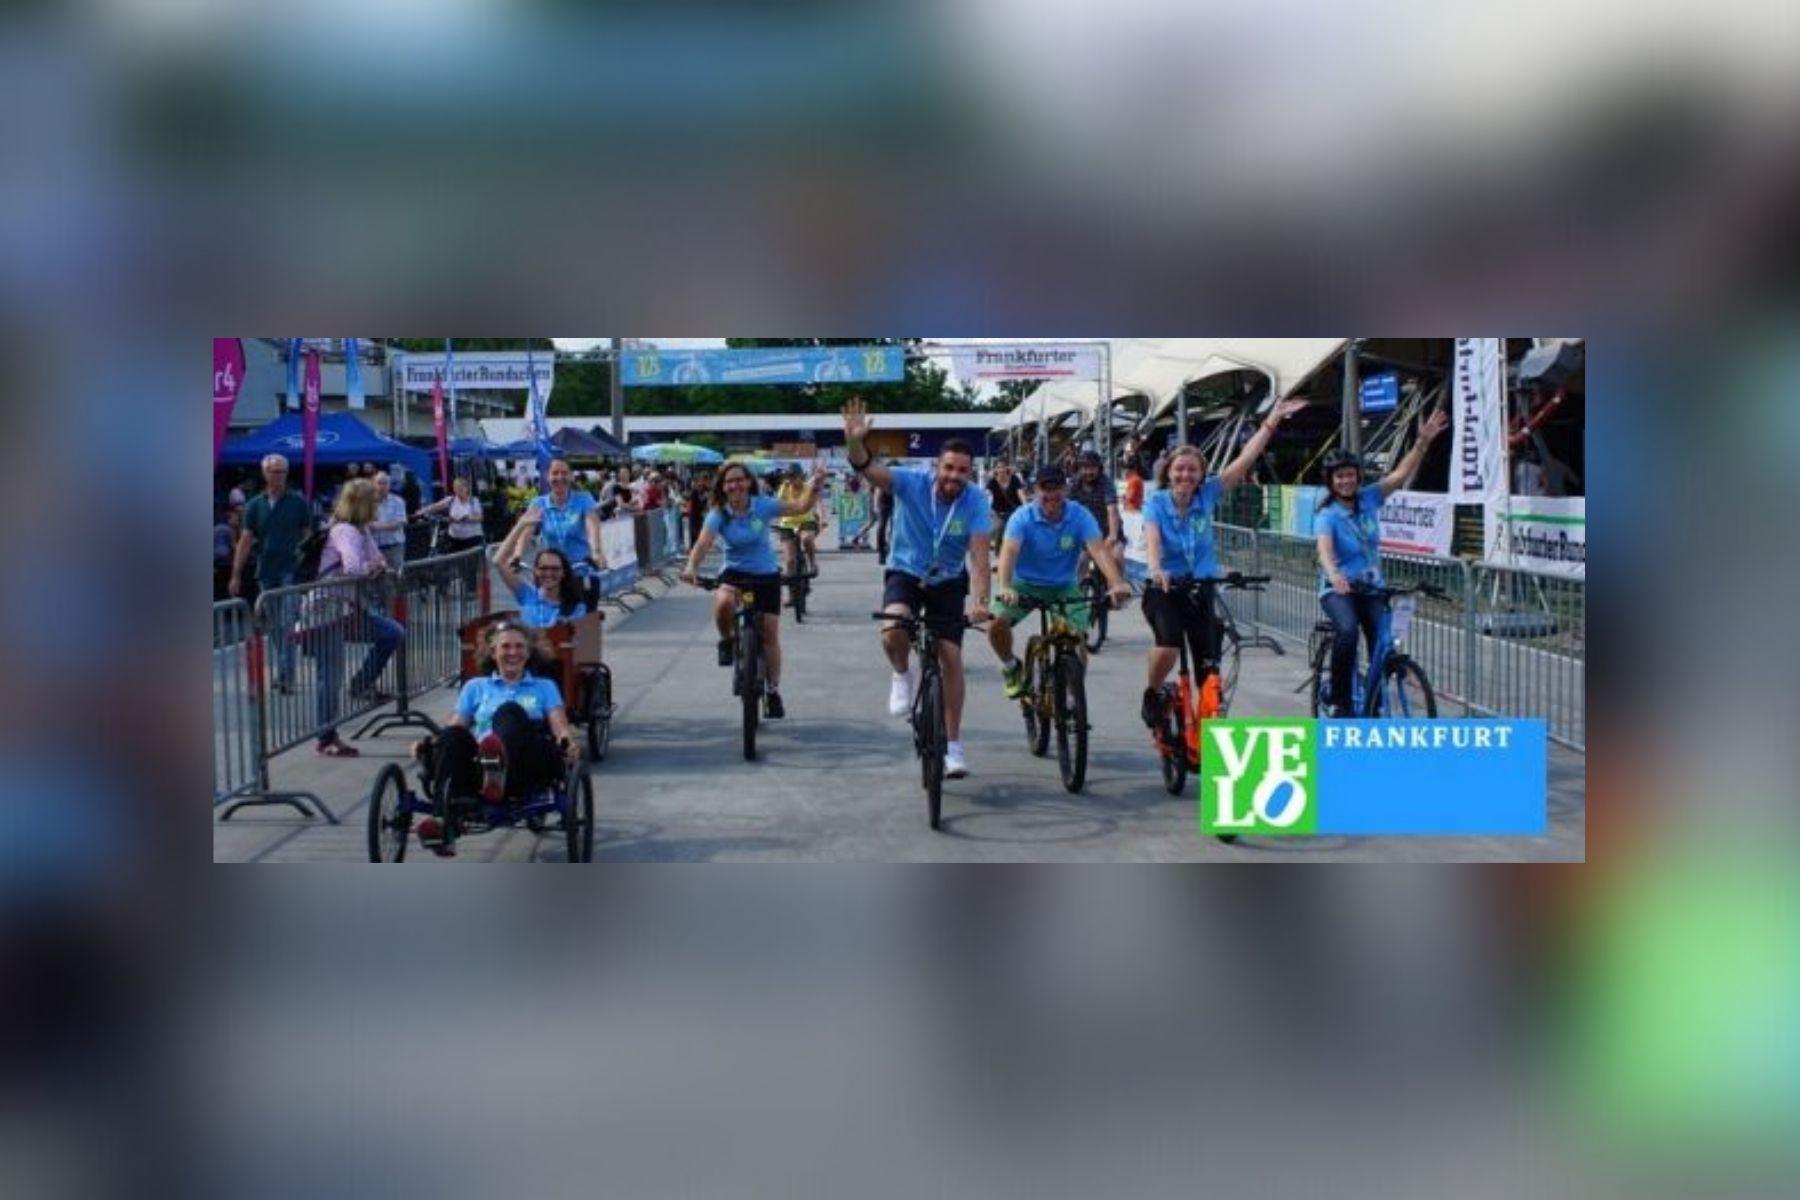 VELOFrankfurt 2021: Fahrrad-Sommerfest jetzt im August